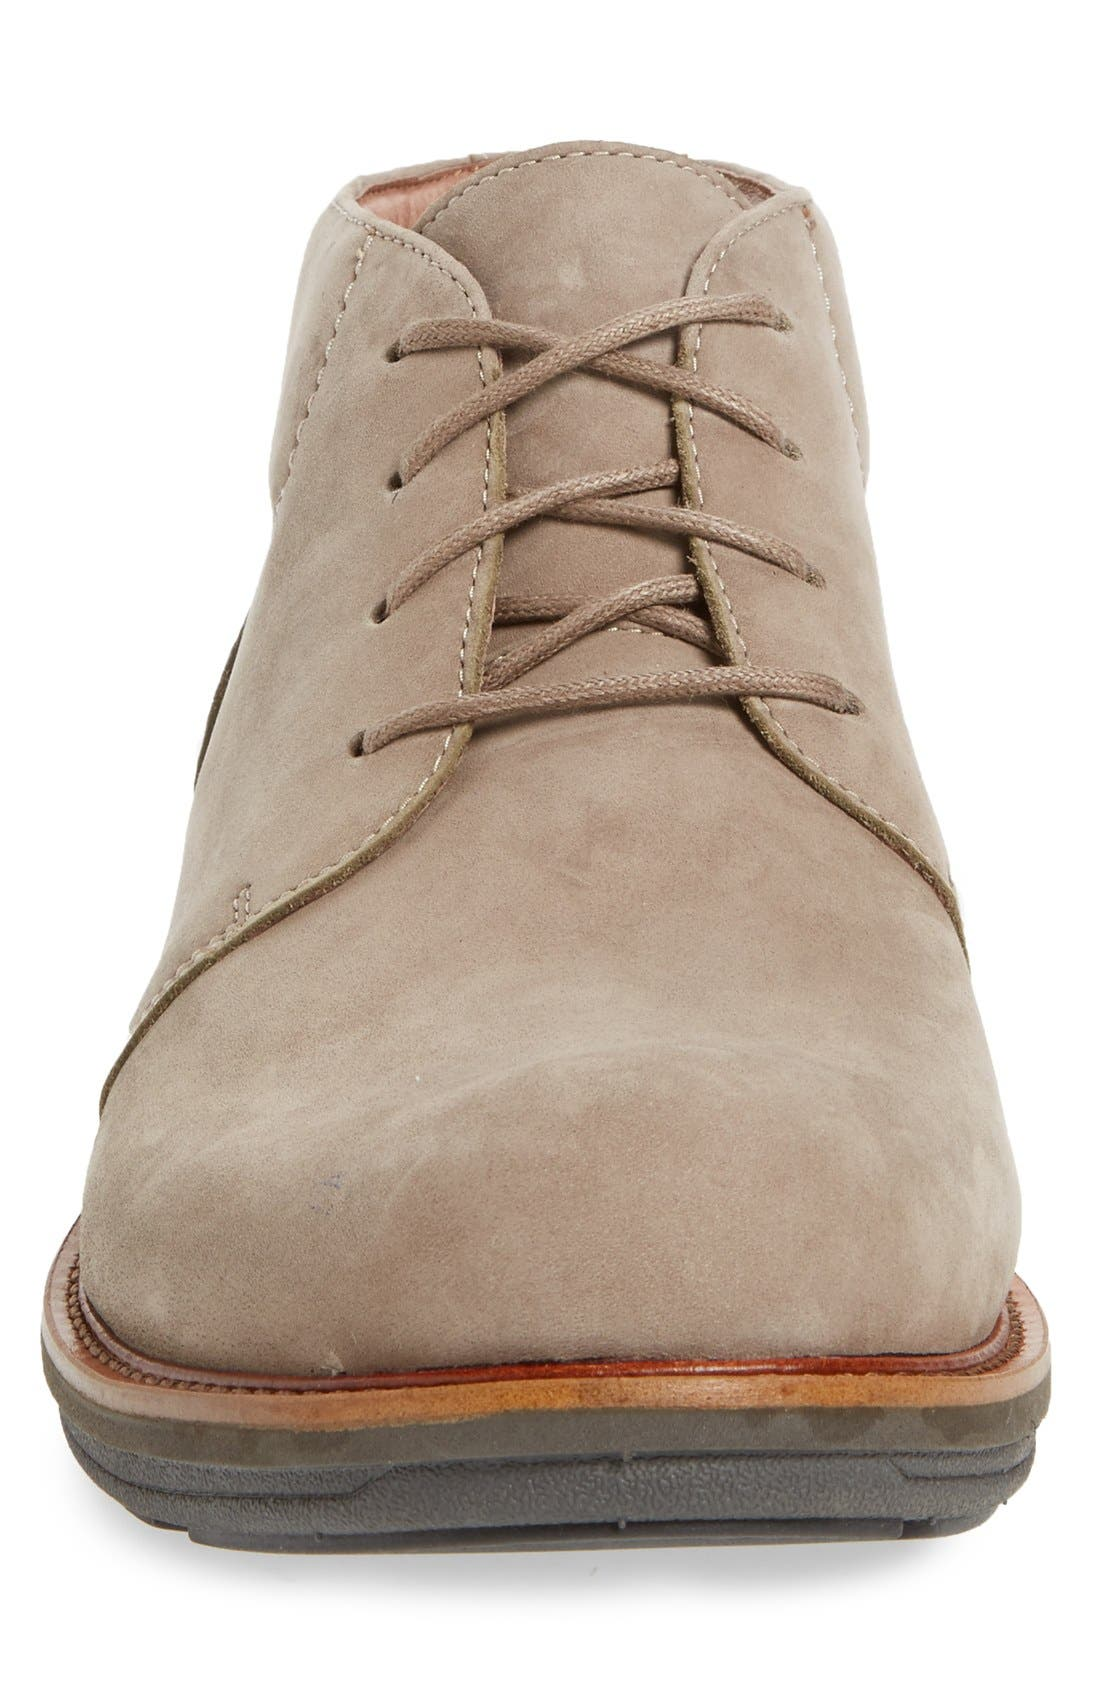 'Jake' Chukka Boot,                             Alternate thumbnail 3, color,                             Taupe Milled Nubuck Leather